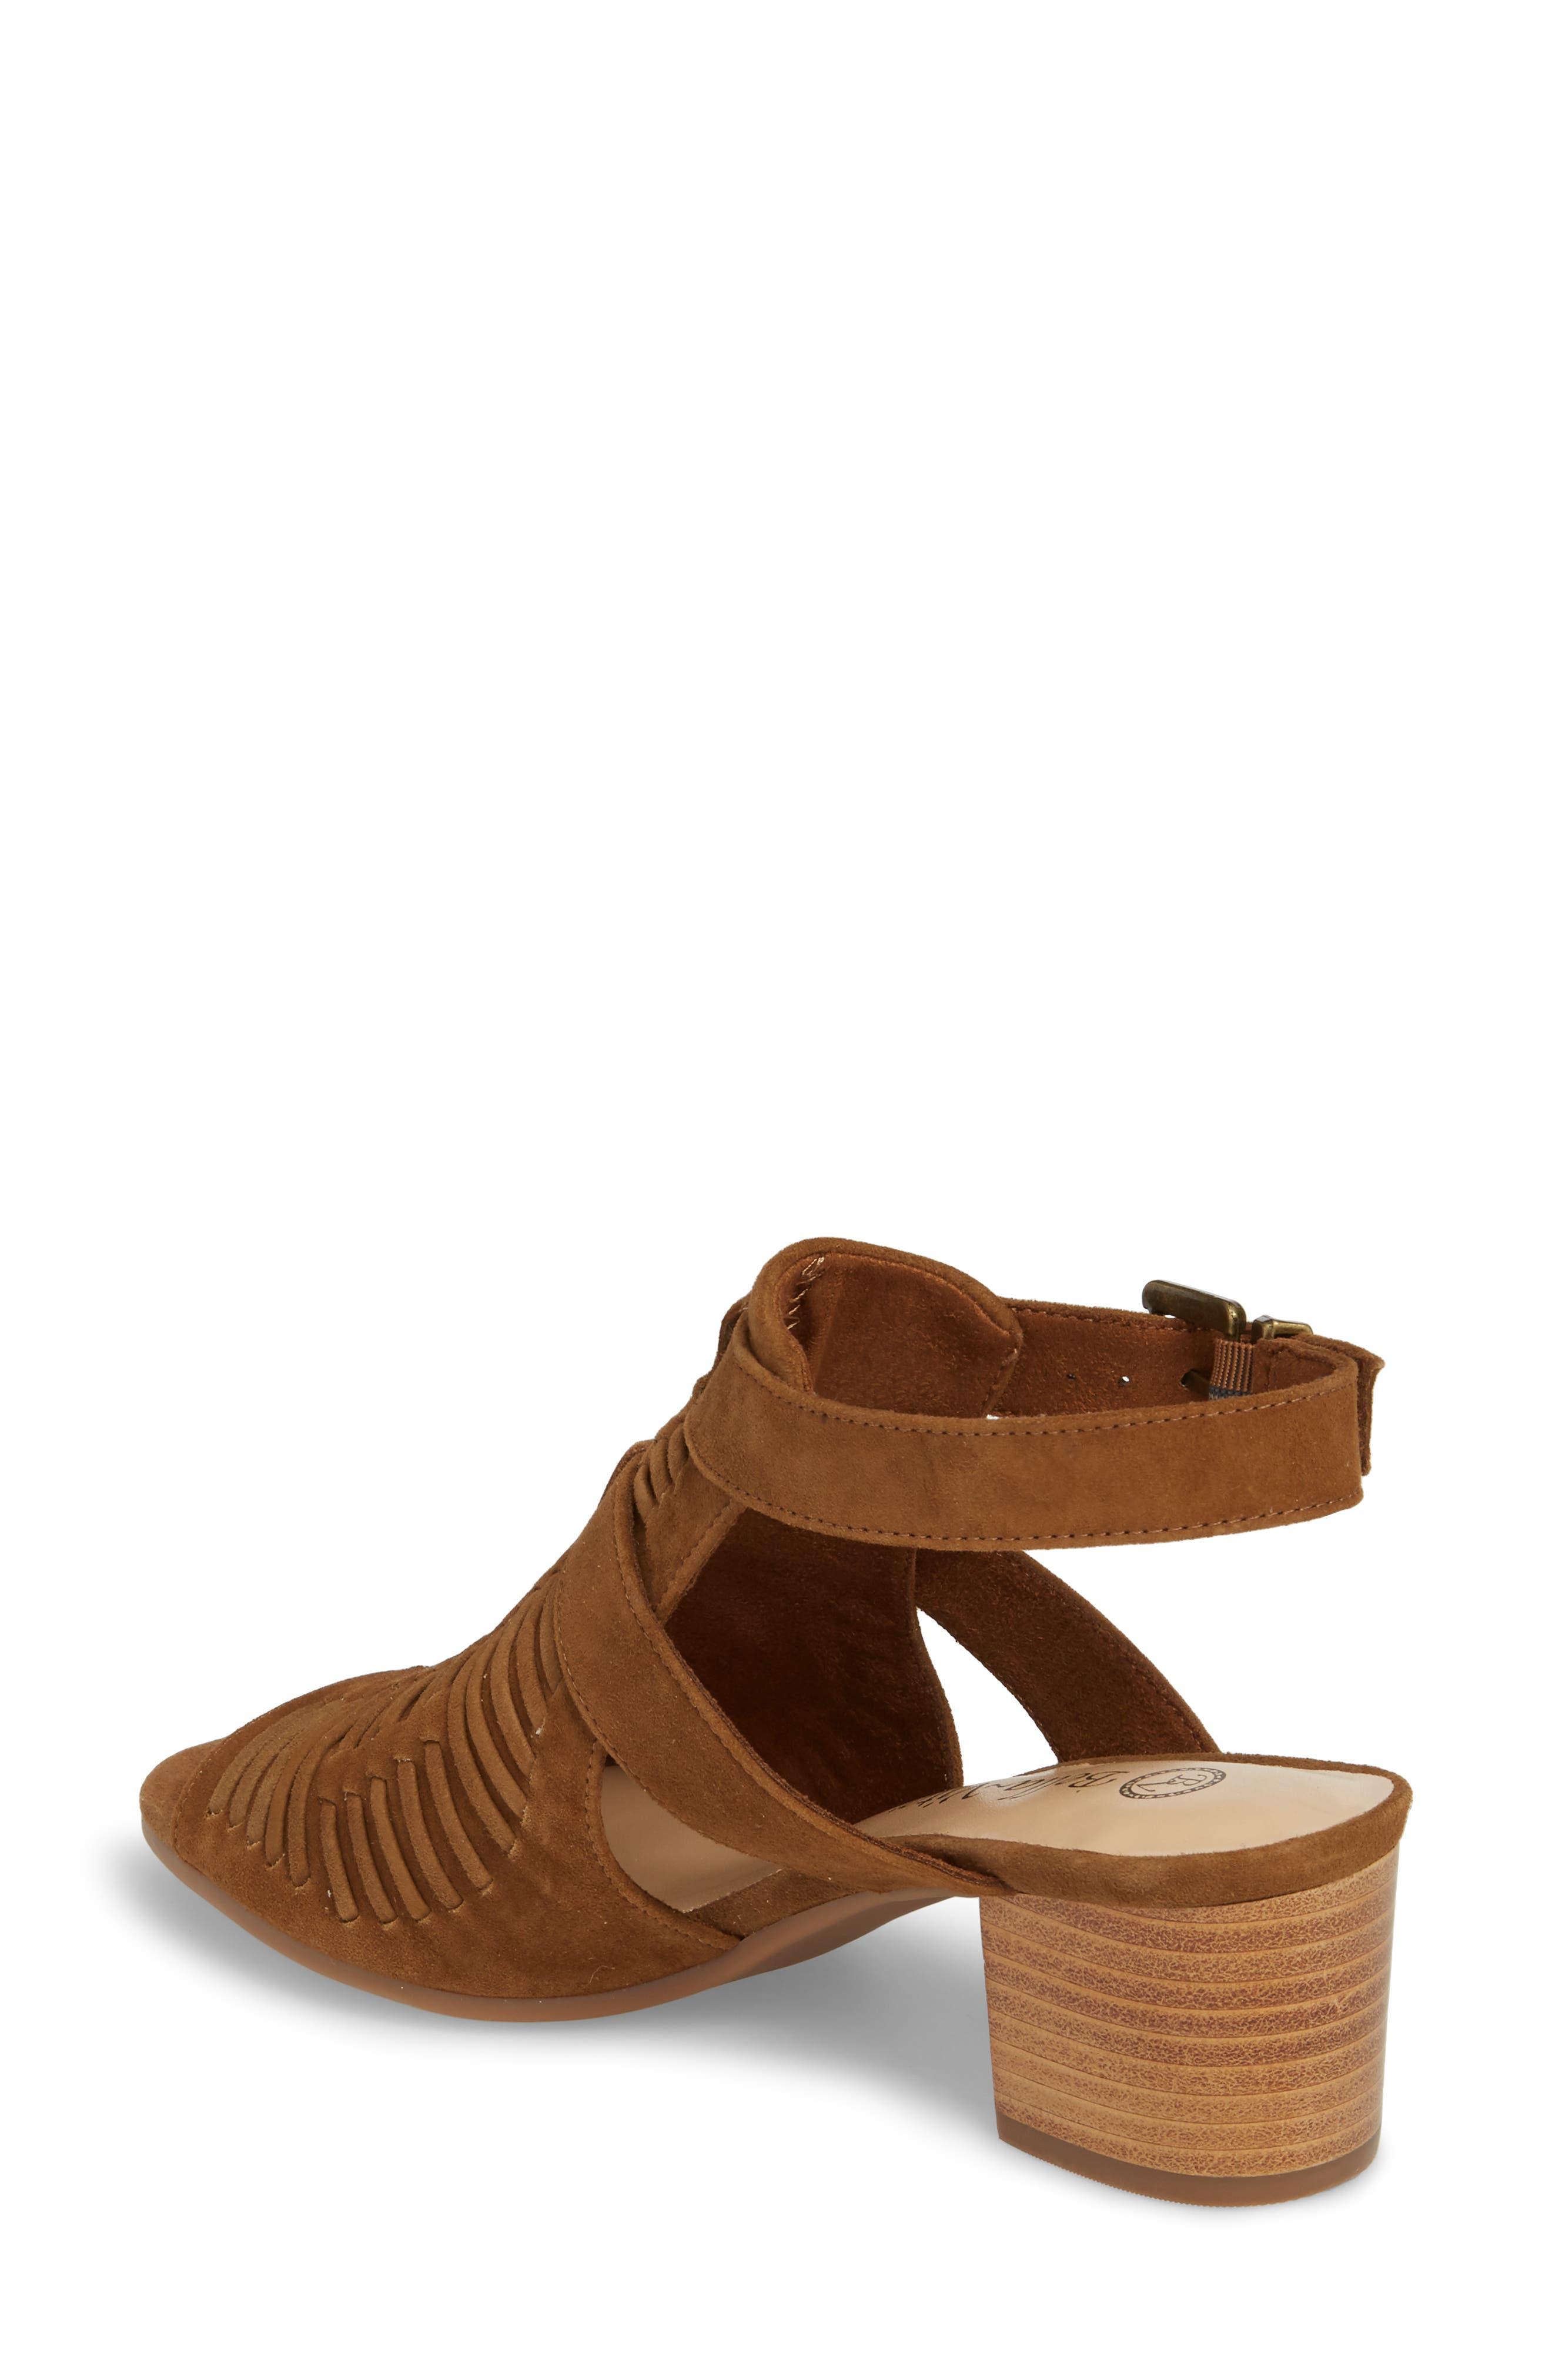 Finley Ankle Strap Sandal,                             Alternate thumbnail 7, color,